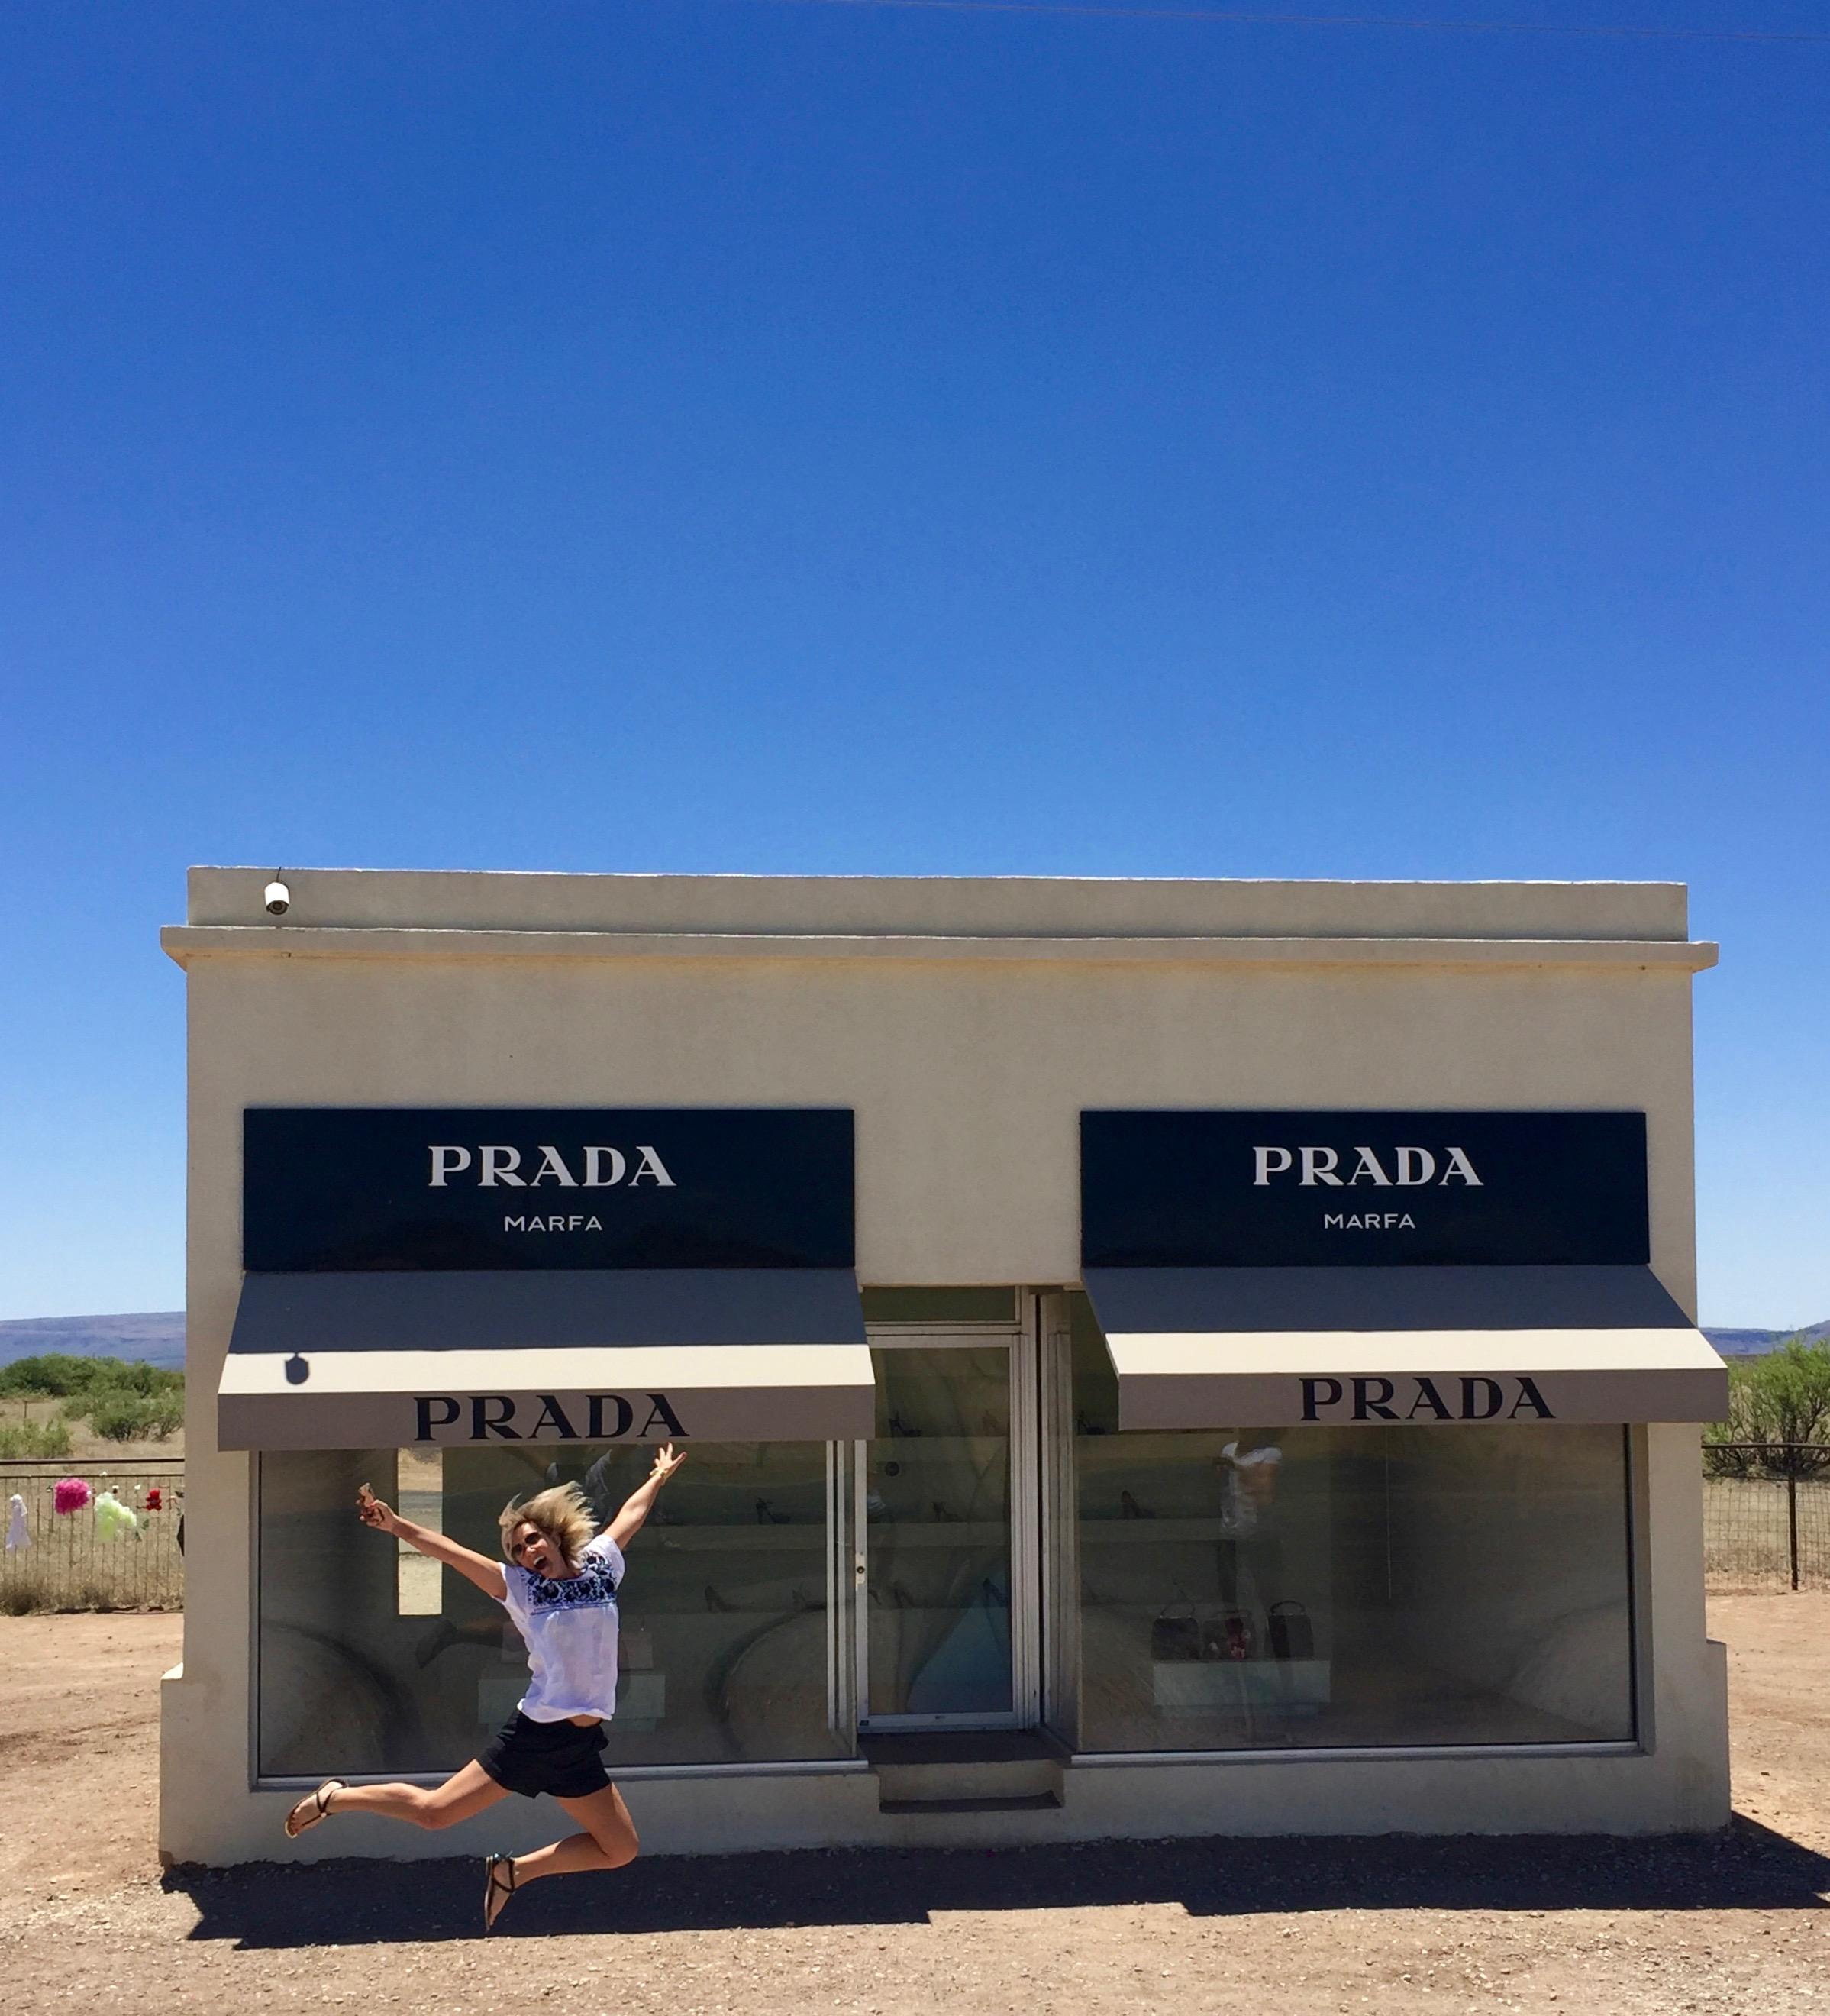 Prada store in Marfa, Texas - 3 Days*